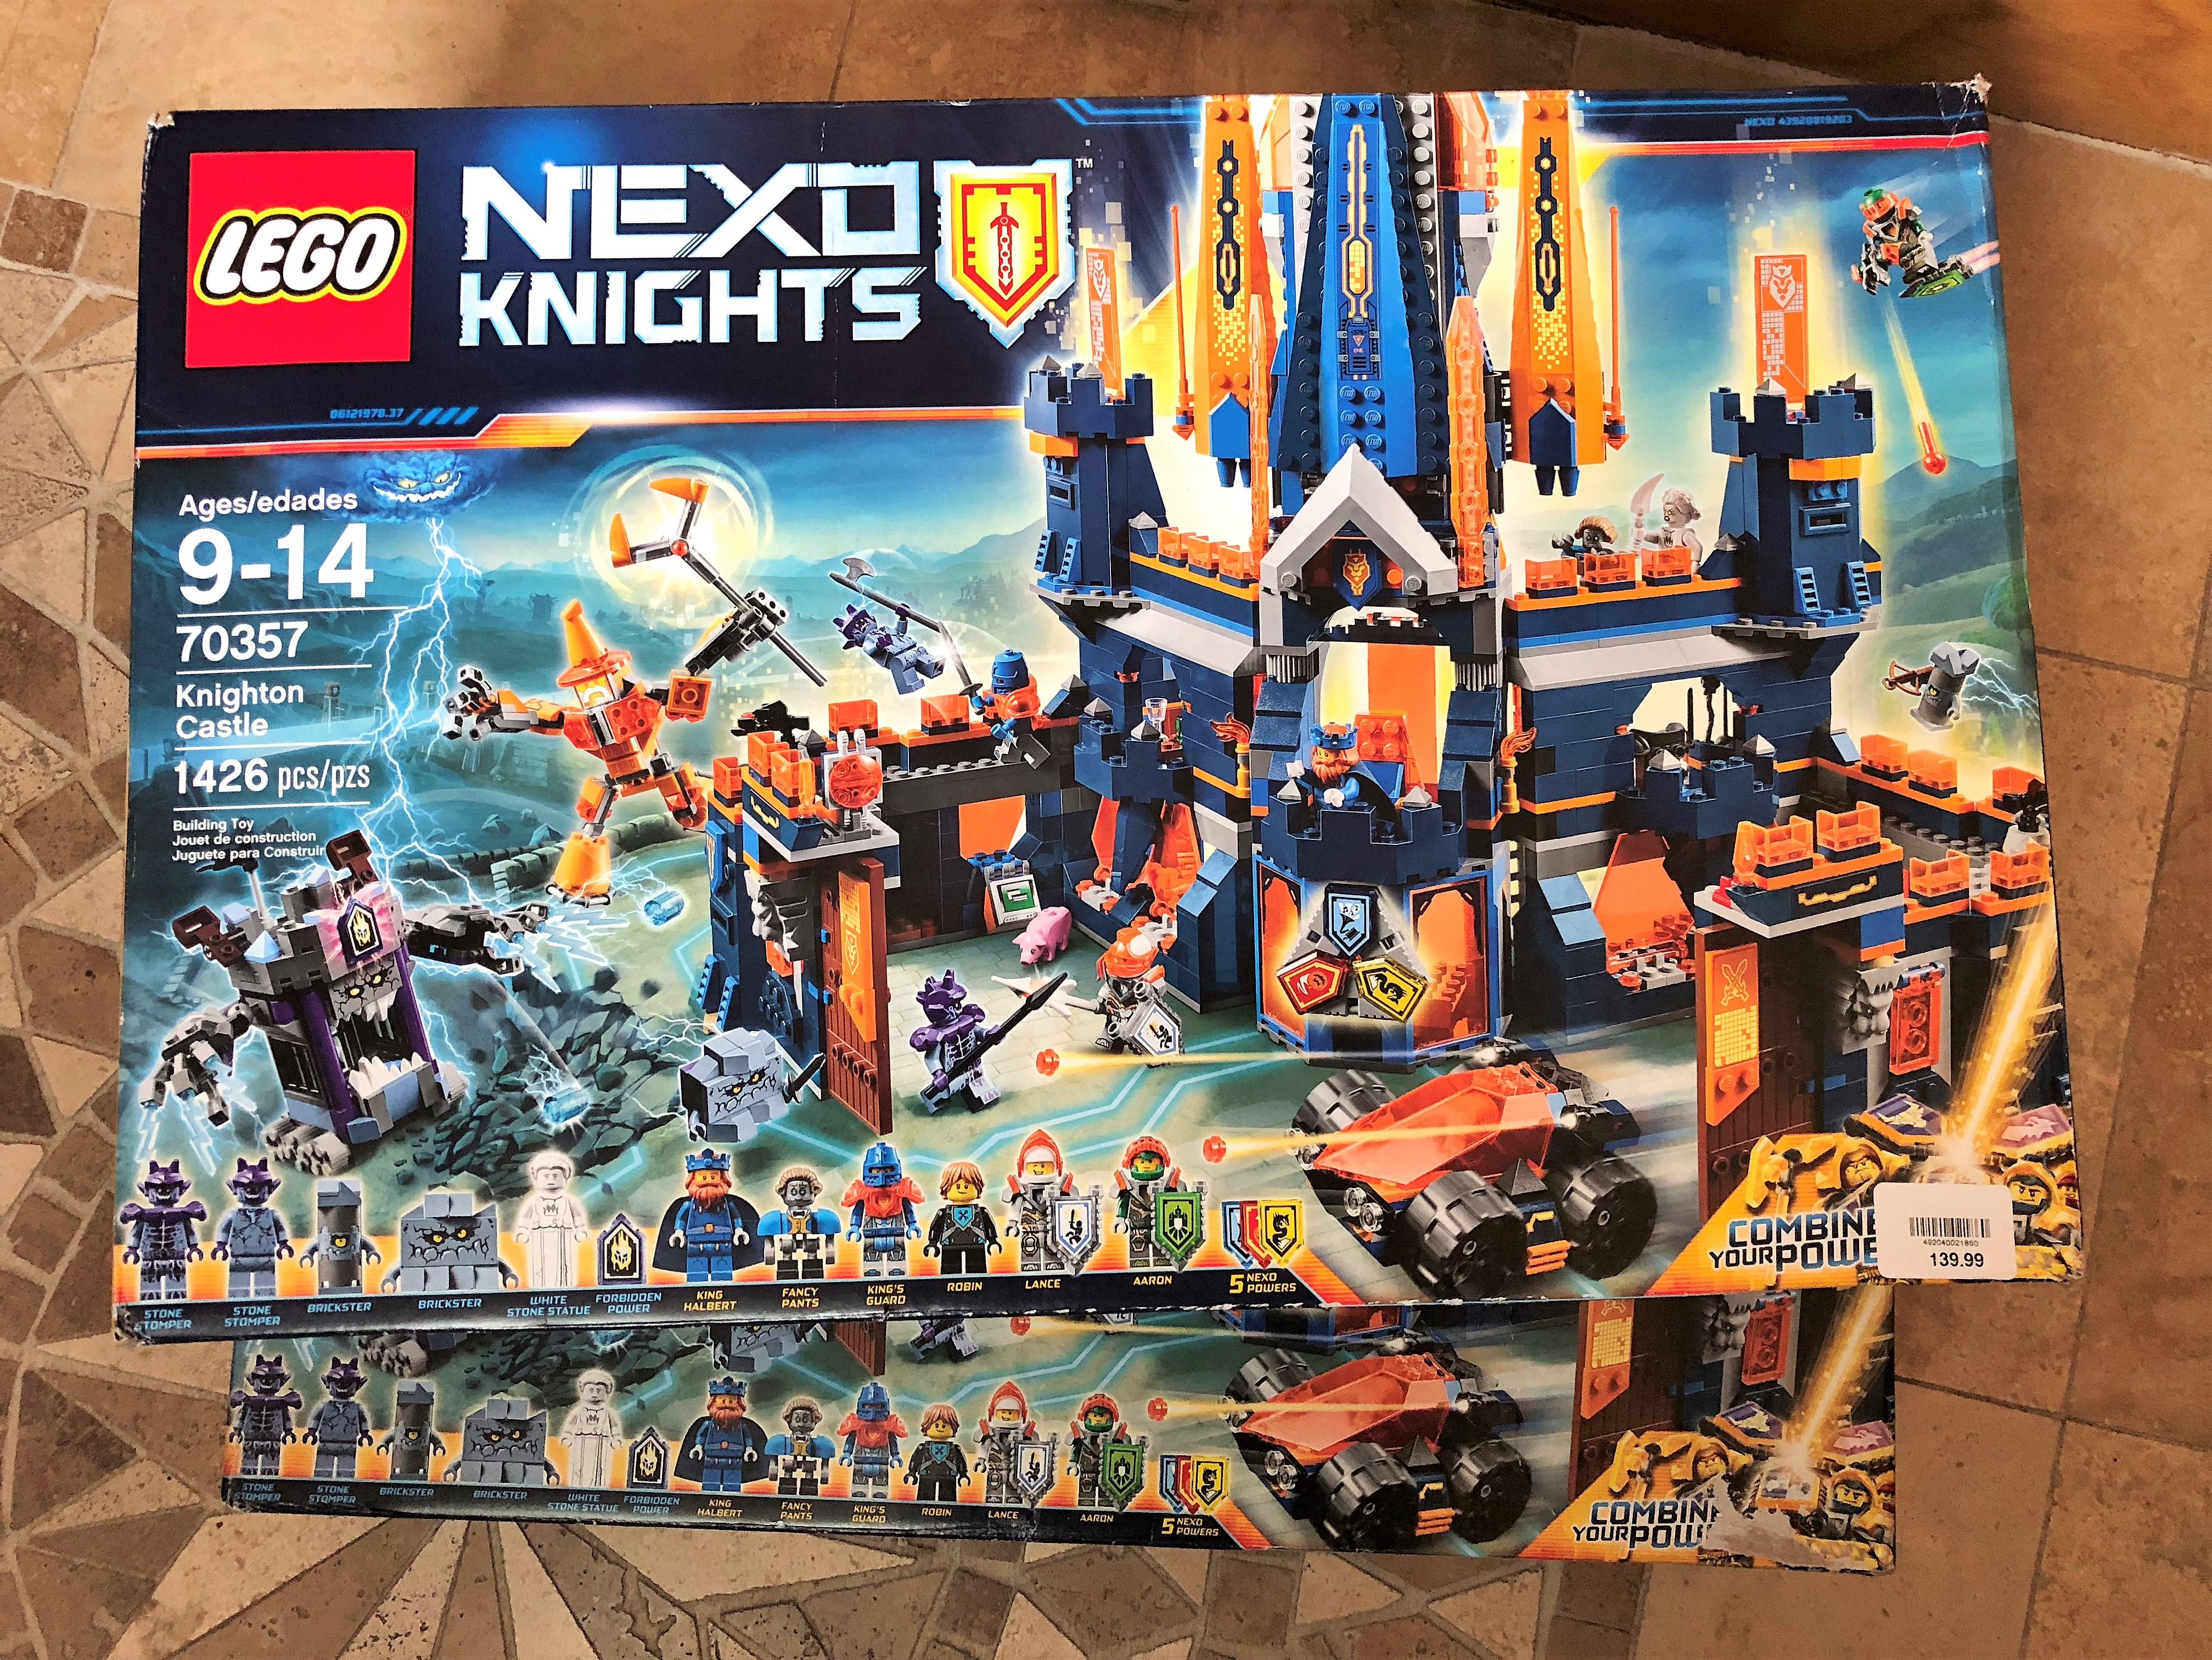 LEGO Nexo Knights - Knighton Castle (70357) - $9.98 at Target - HUGE YMMV